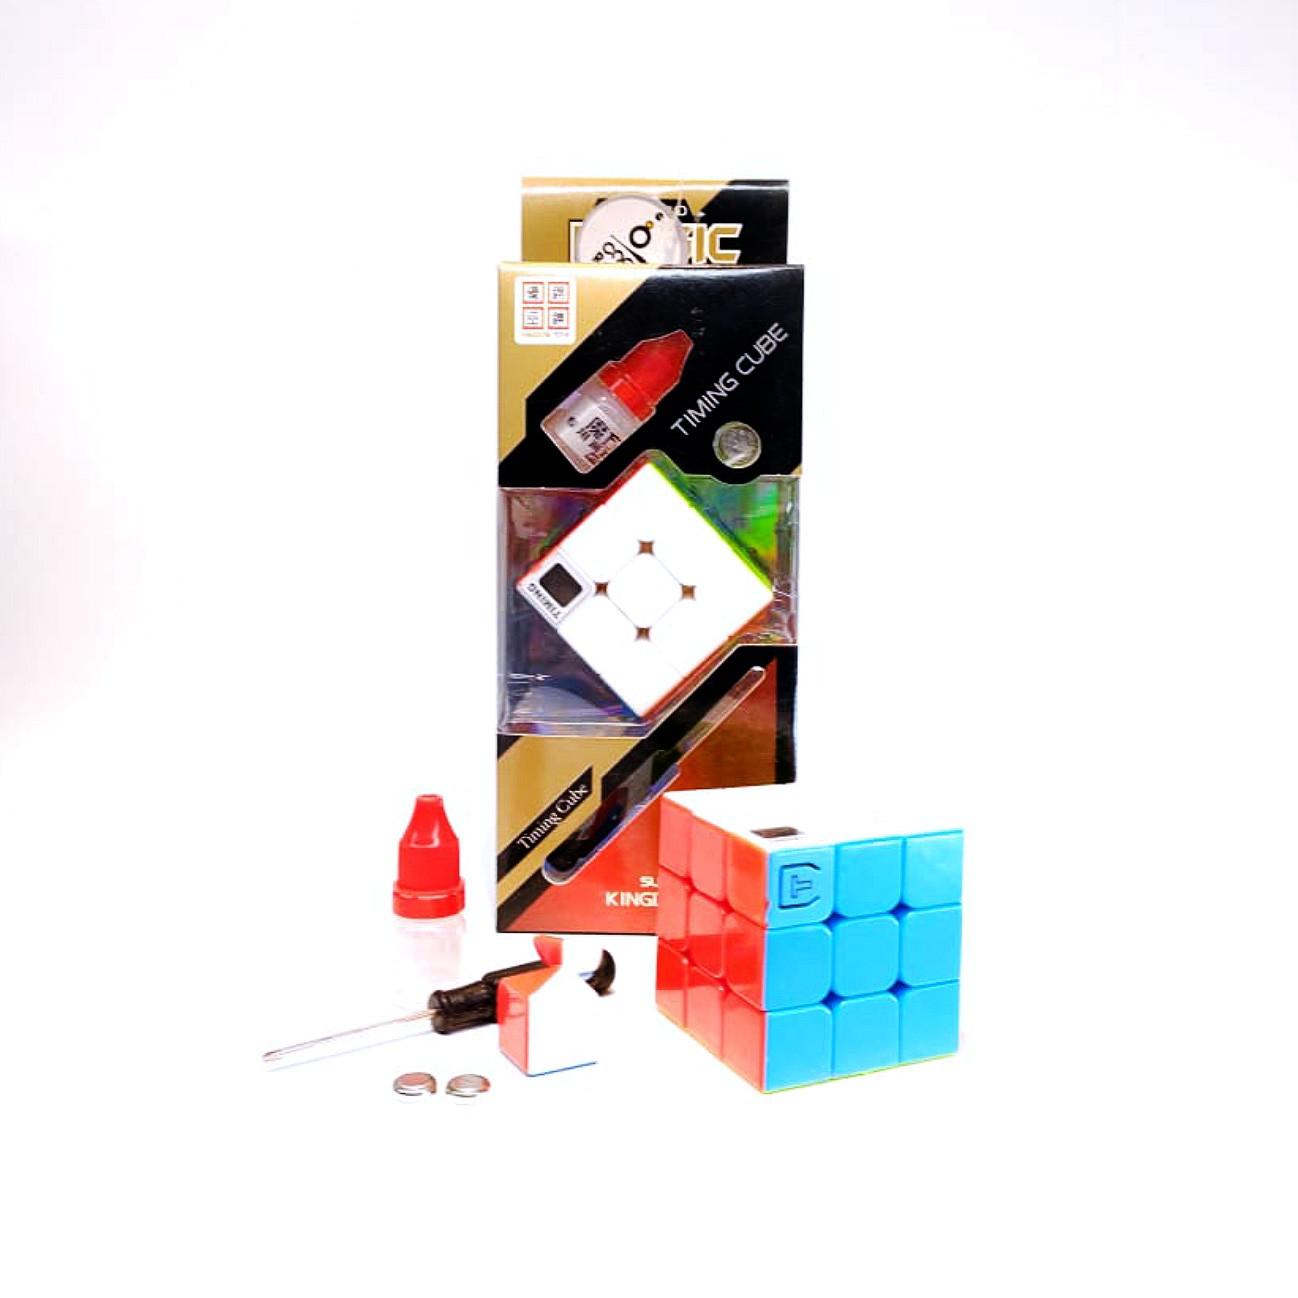 3X3X3 Cubo Mágico Timing